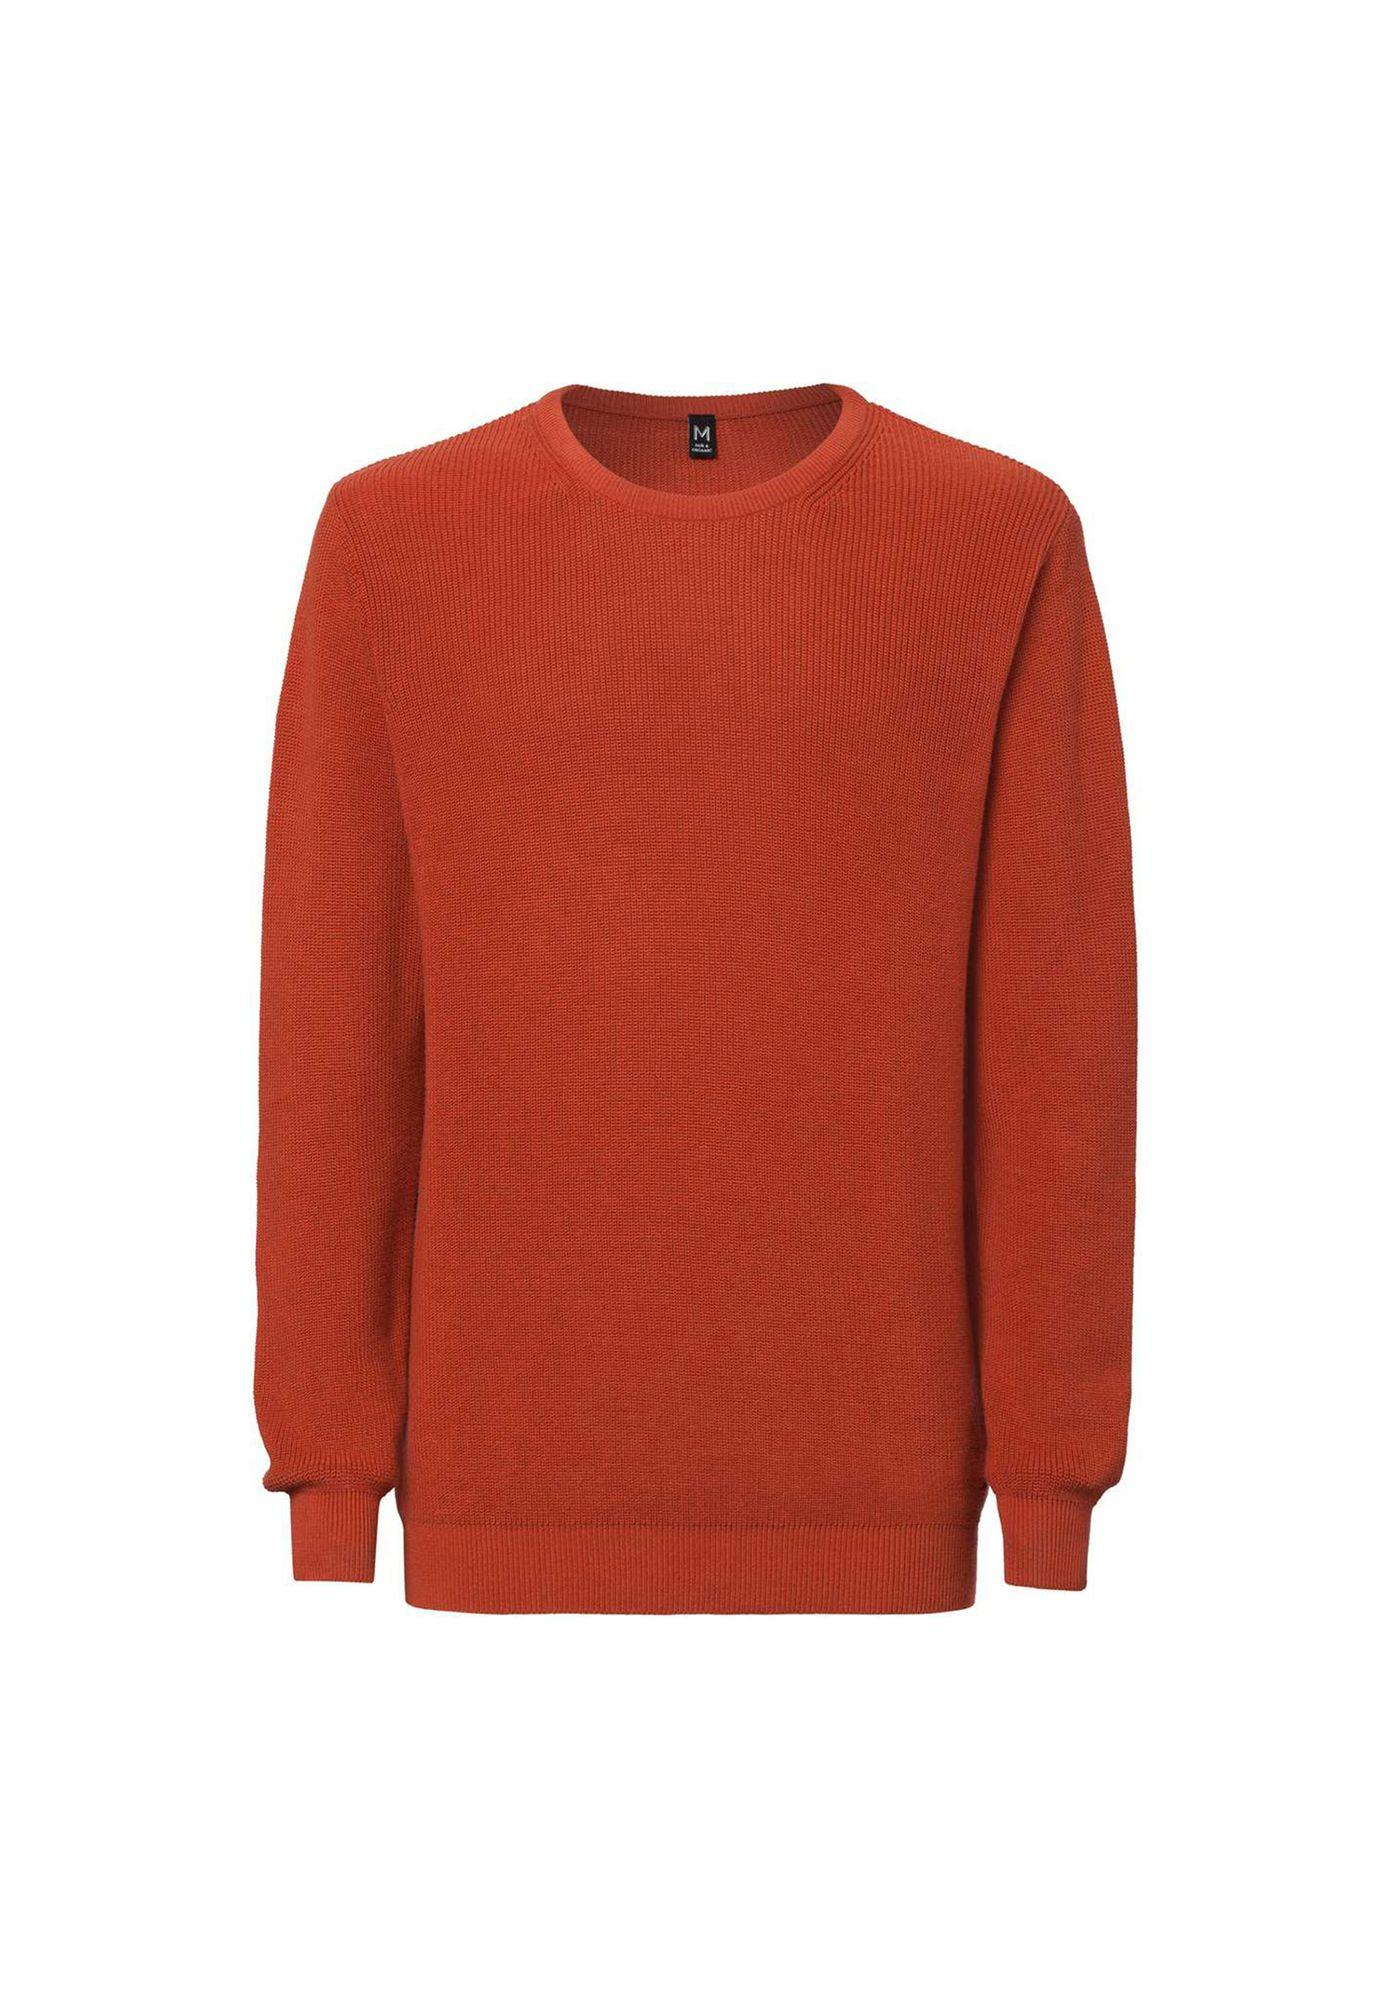 TT3002 Pullover Tangerine